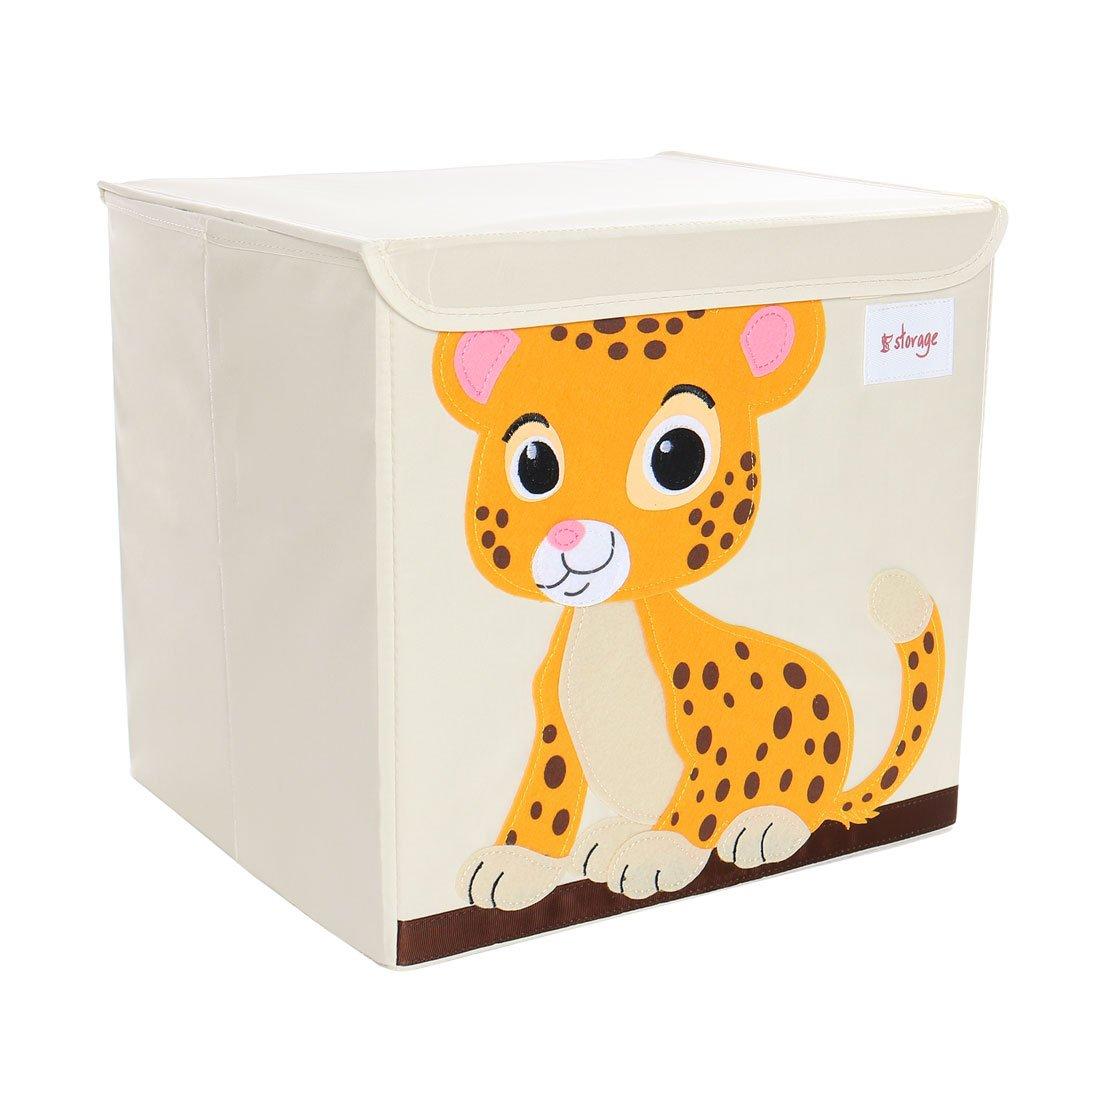 "PICCOCASA Foldable Toy Storage Bins Square Cartoon Animal Nonwovens Storage Box Eco-Friendly Fabric Storage Cubes Organizer for Bedroom Playroom Lid Orange Panther Pattern 13""x13""x13.6"""